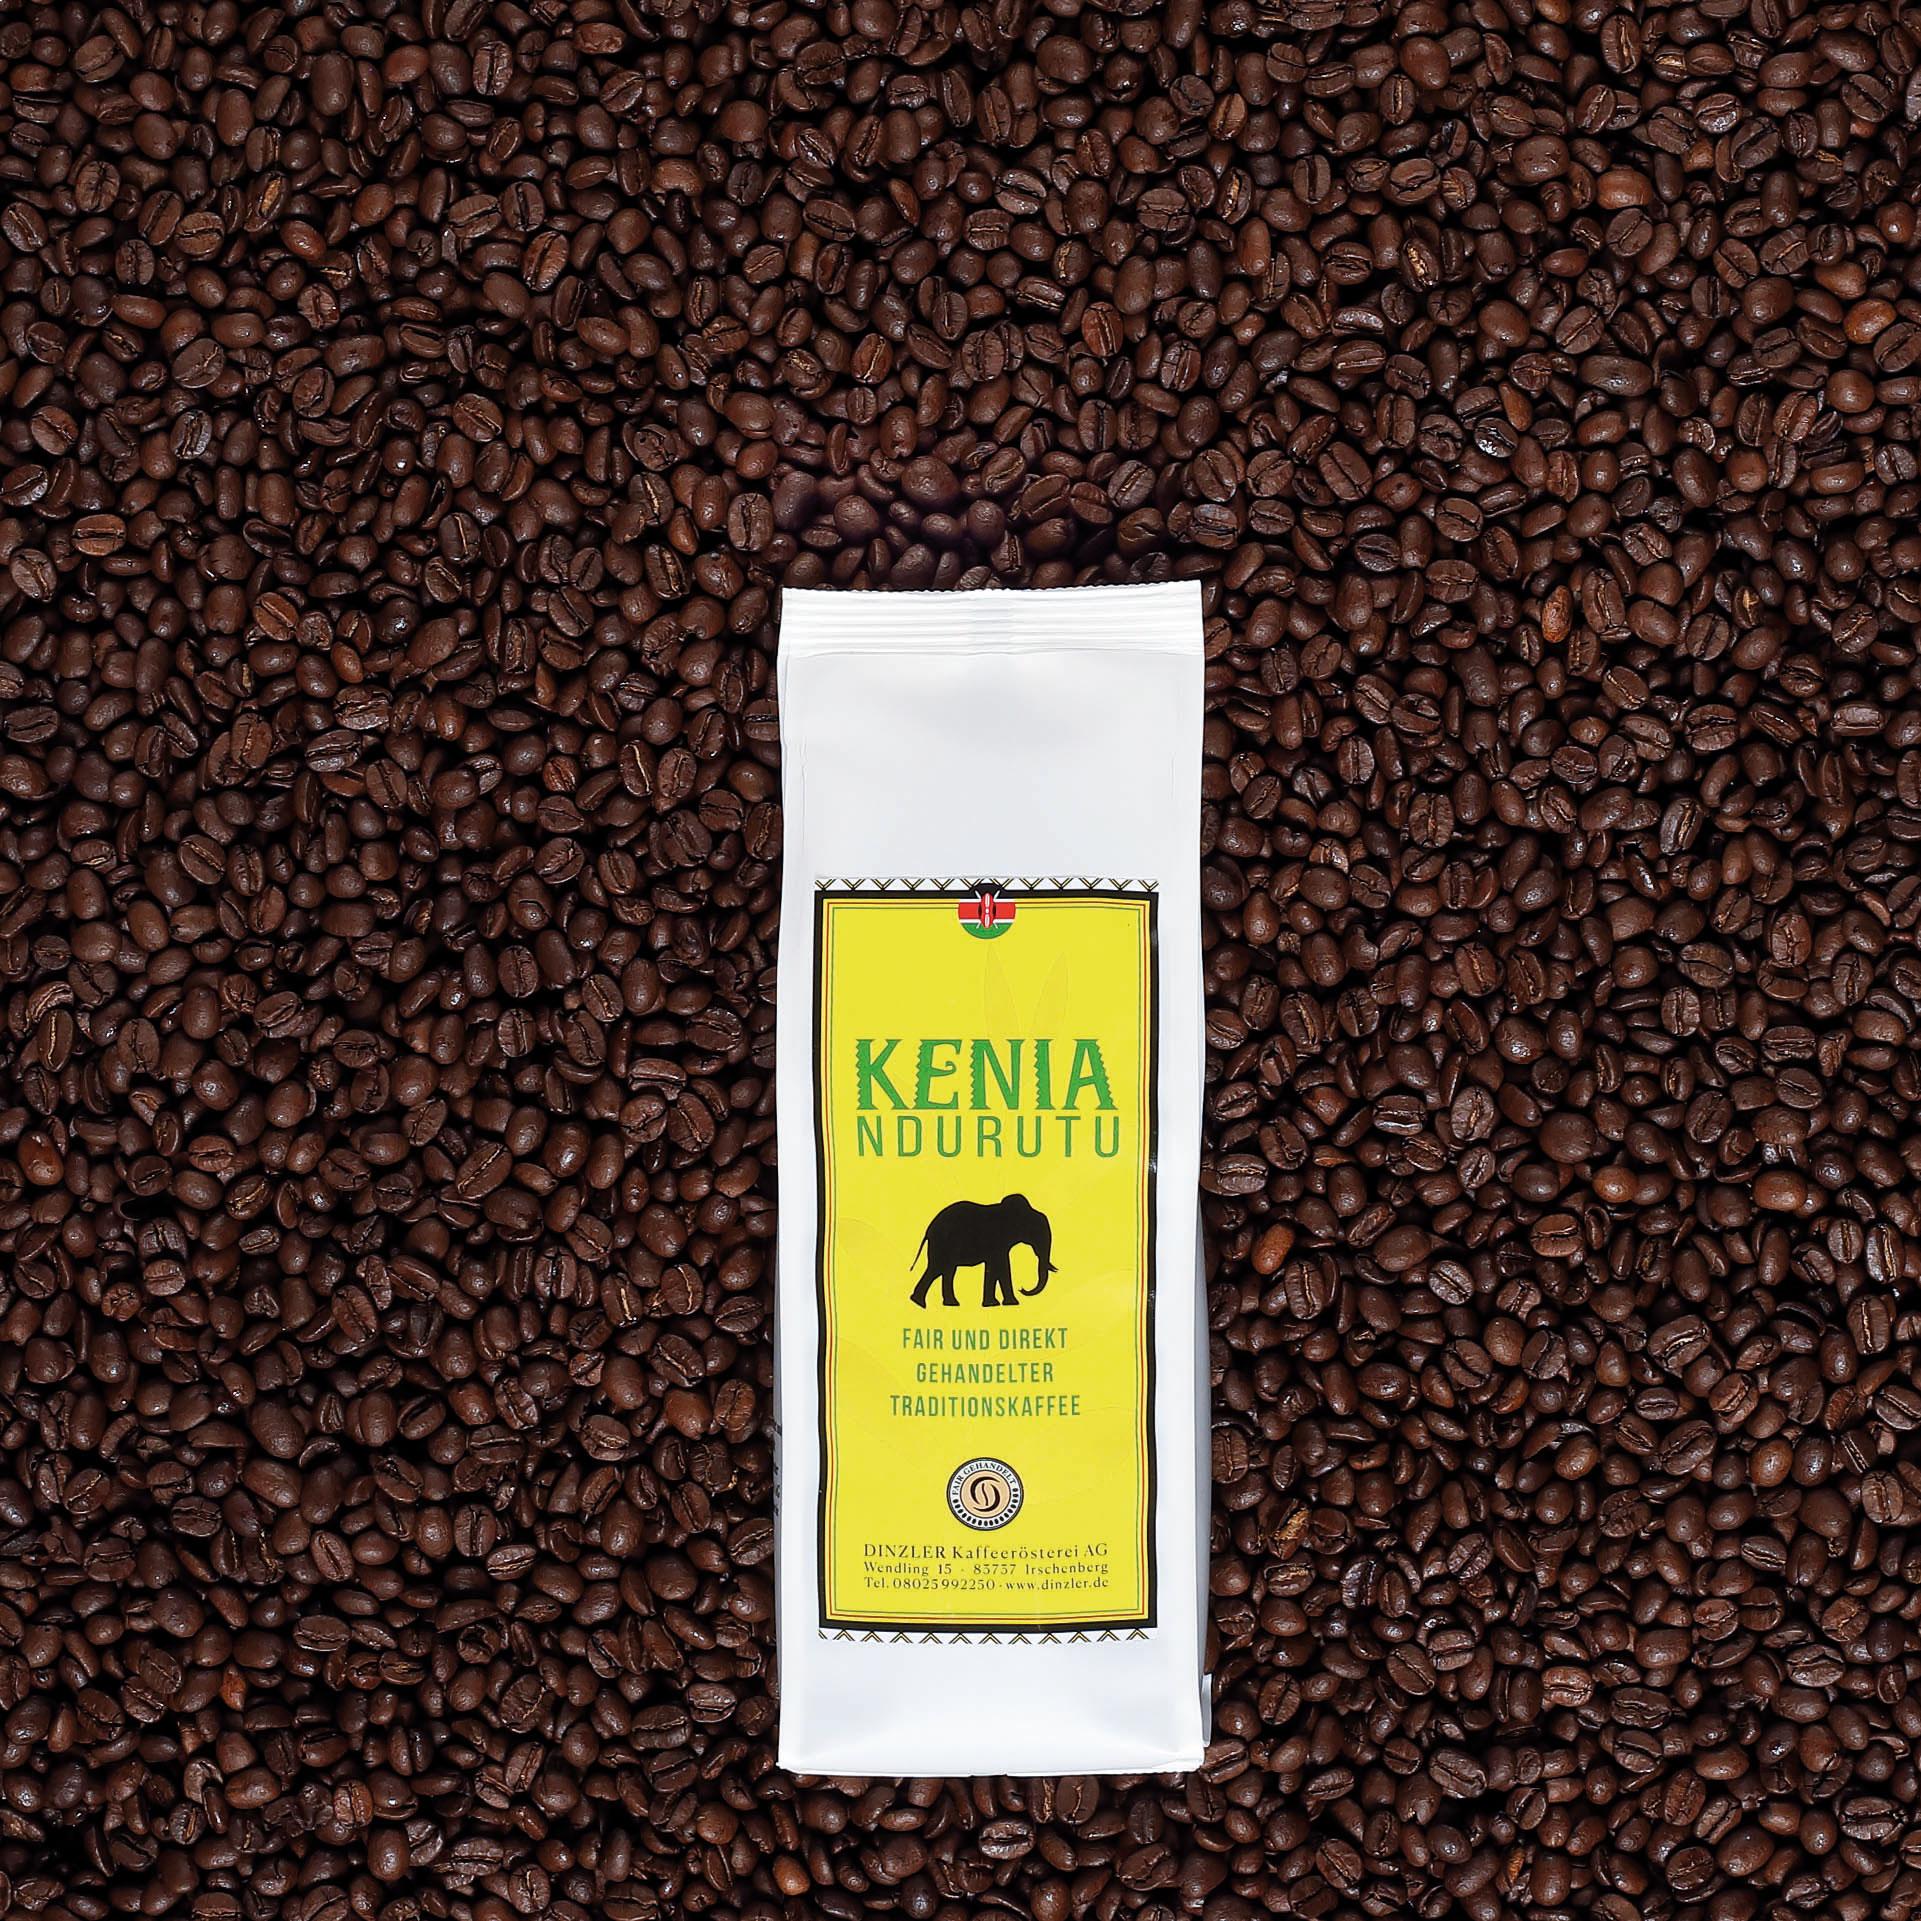 Kaffee Kenia Ndurutu | DINZLER Shop